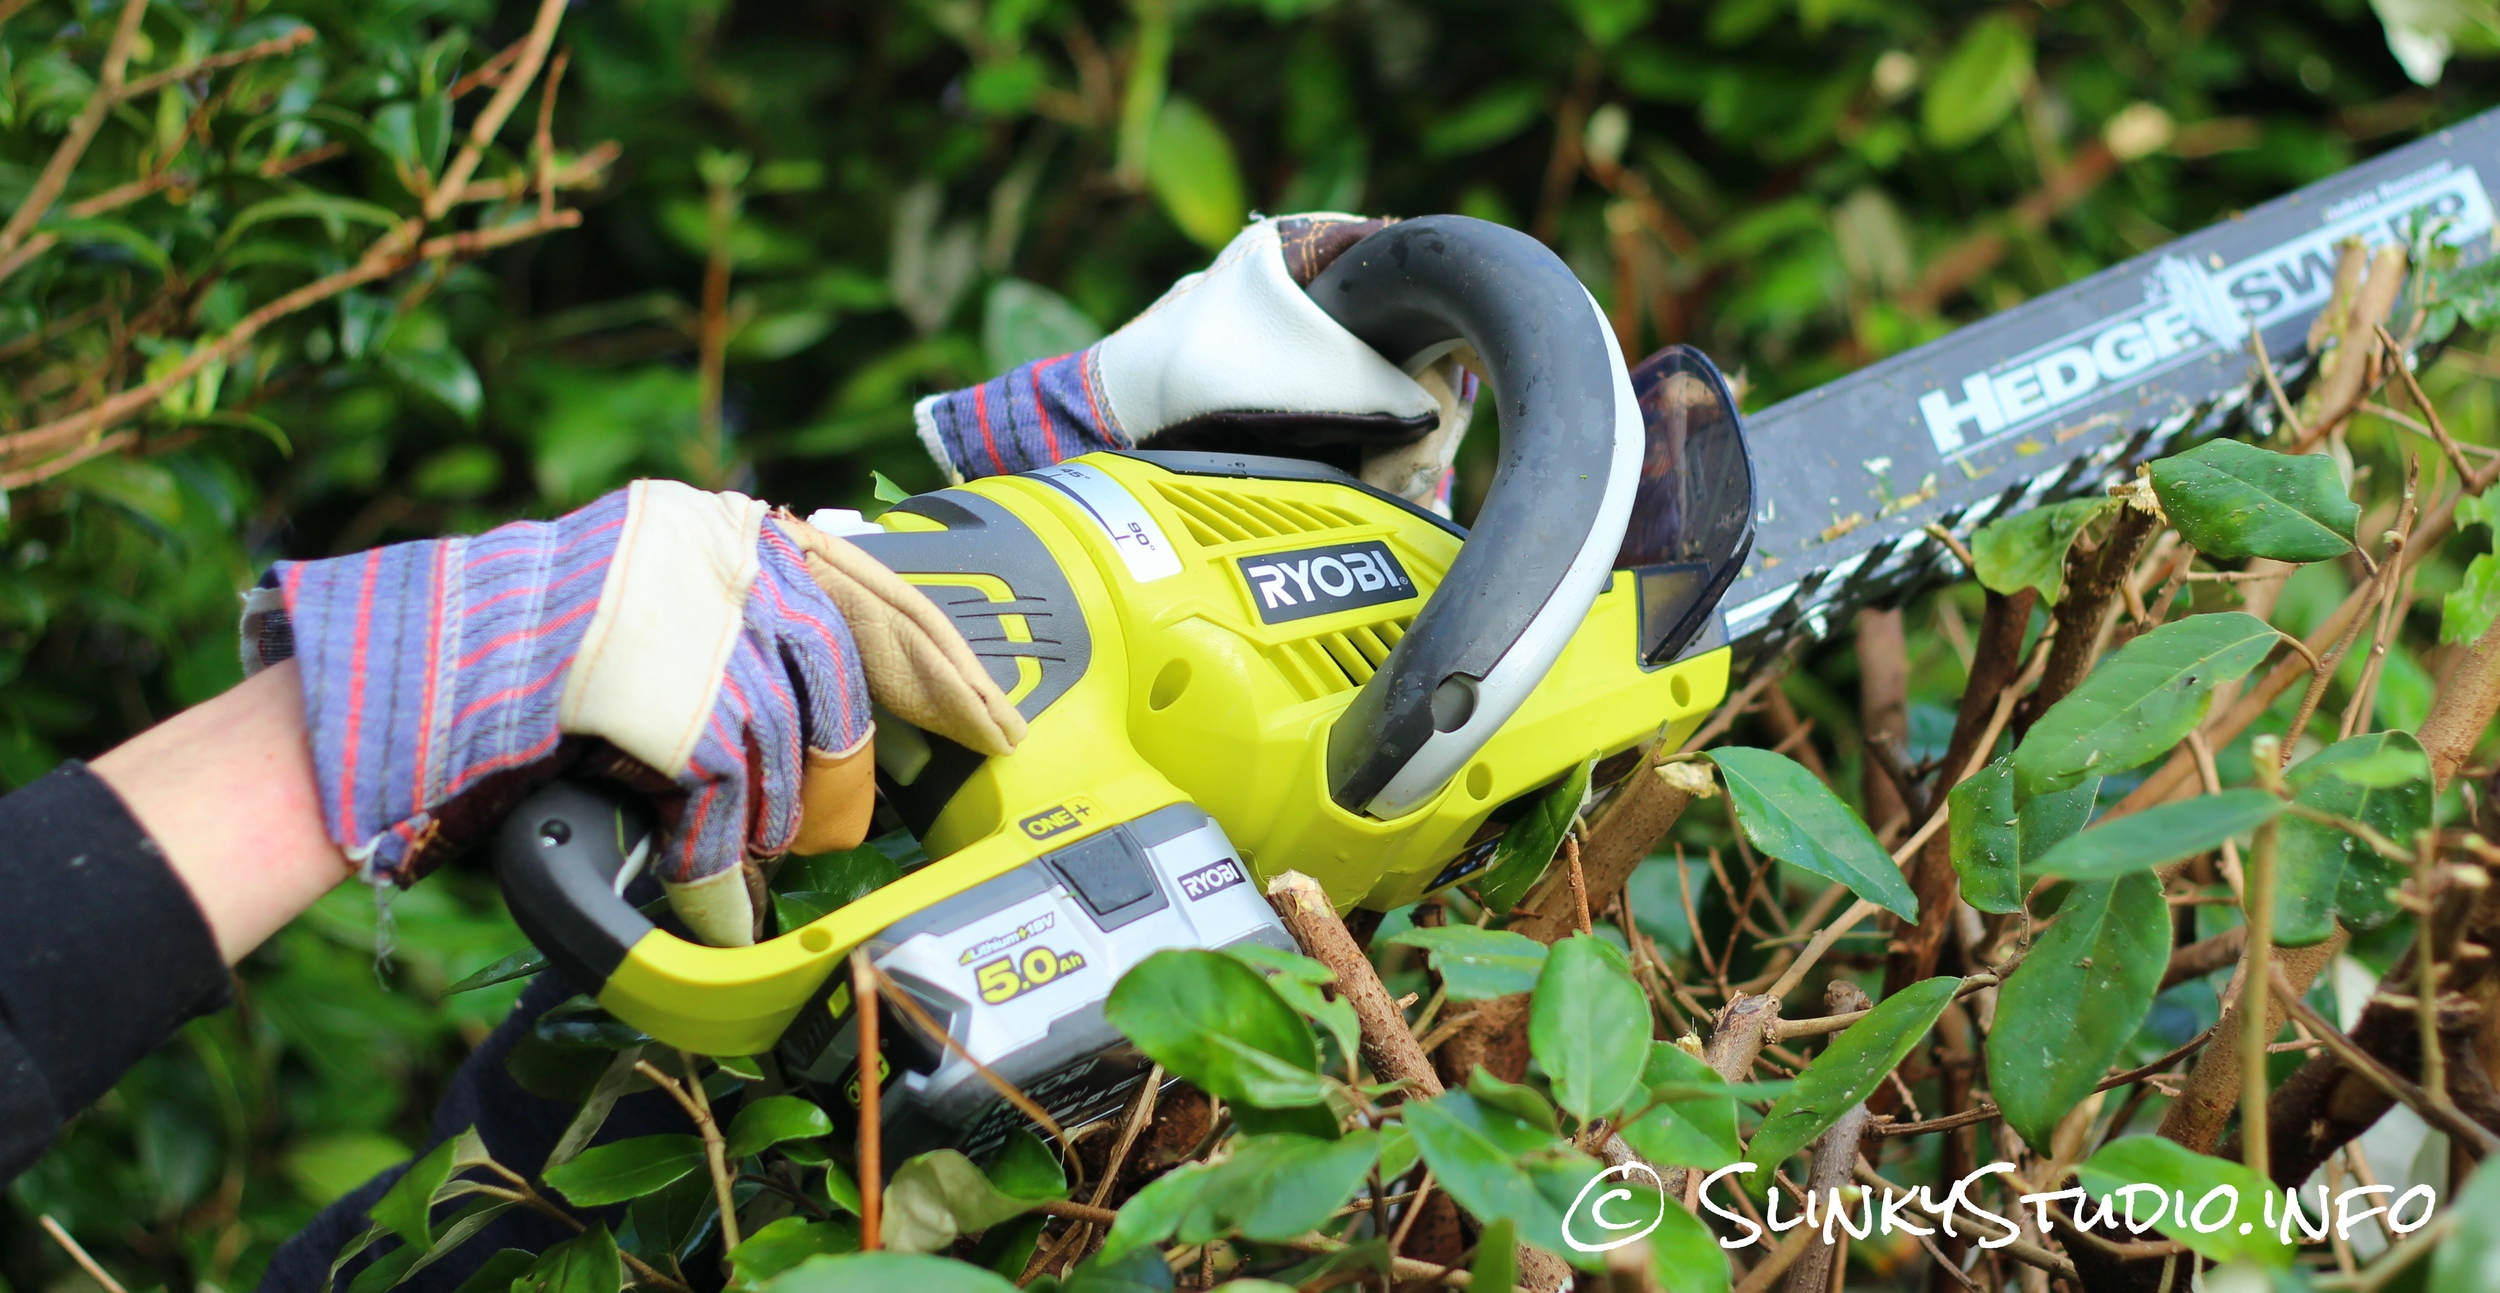 Ryobi One+ Hedge Trimmer Angle.jpg